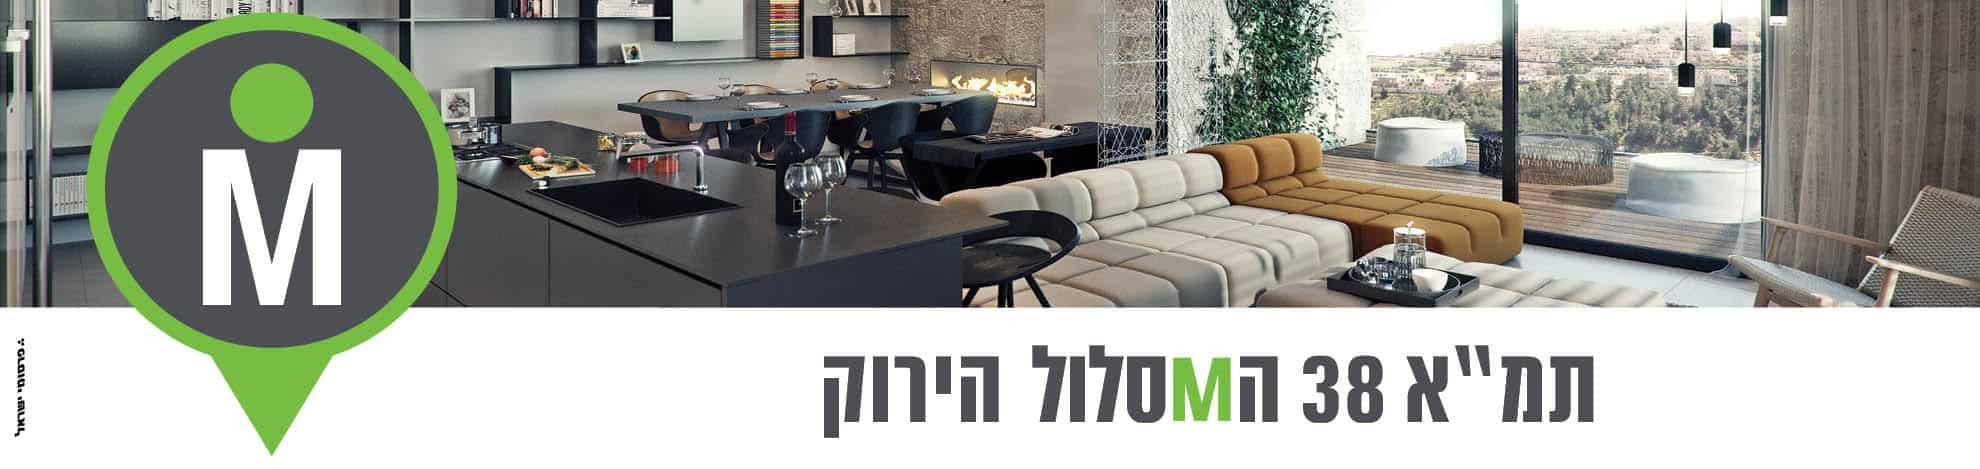 maslol_yarok_heder4-1